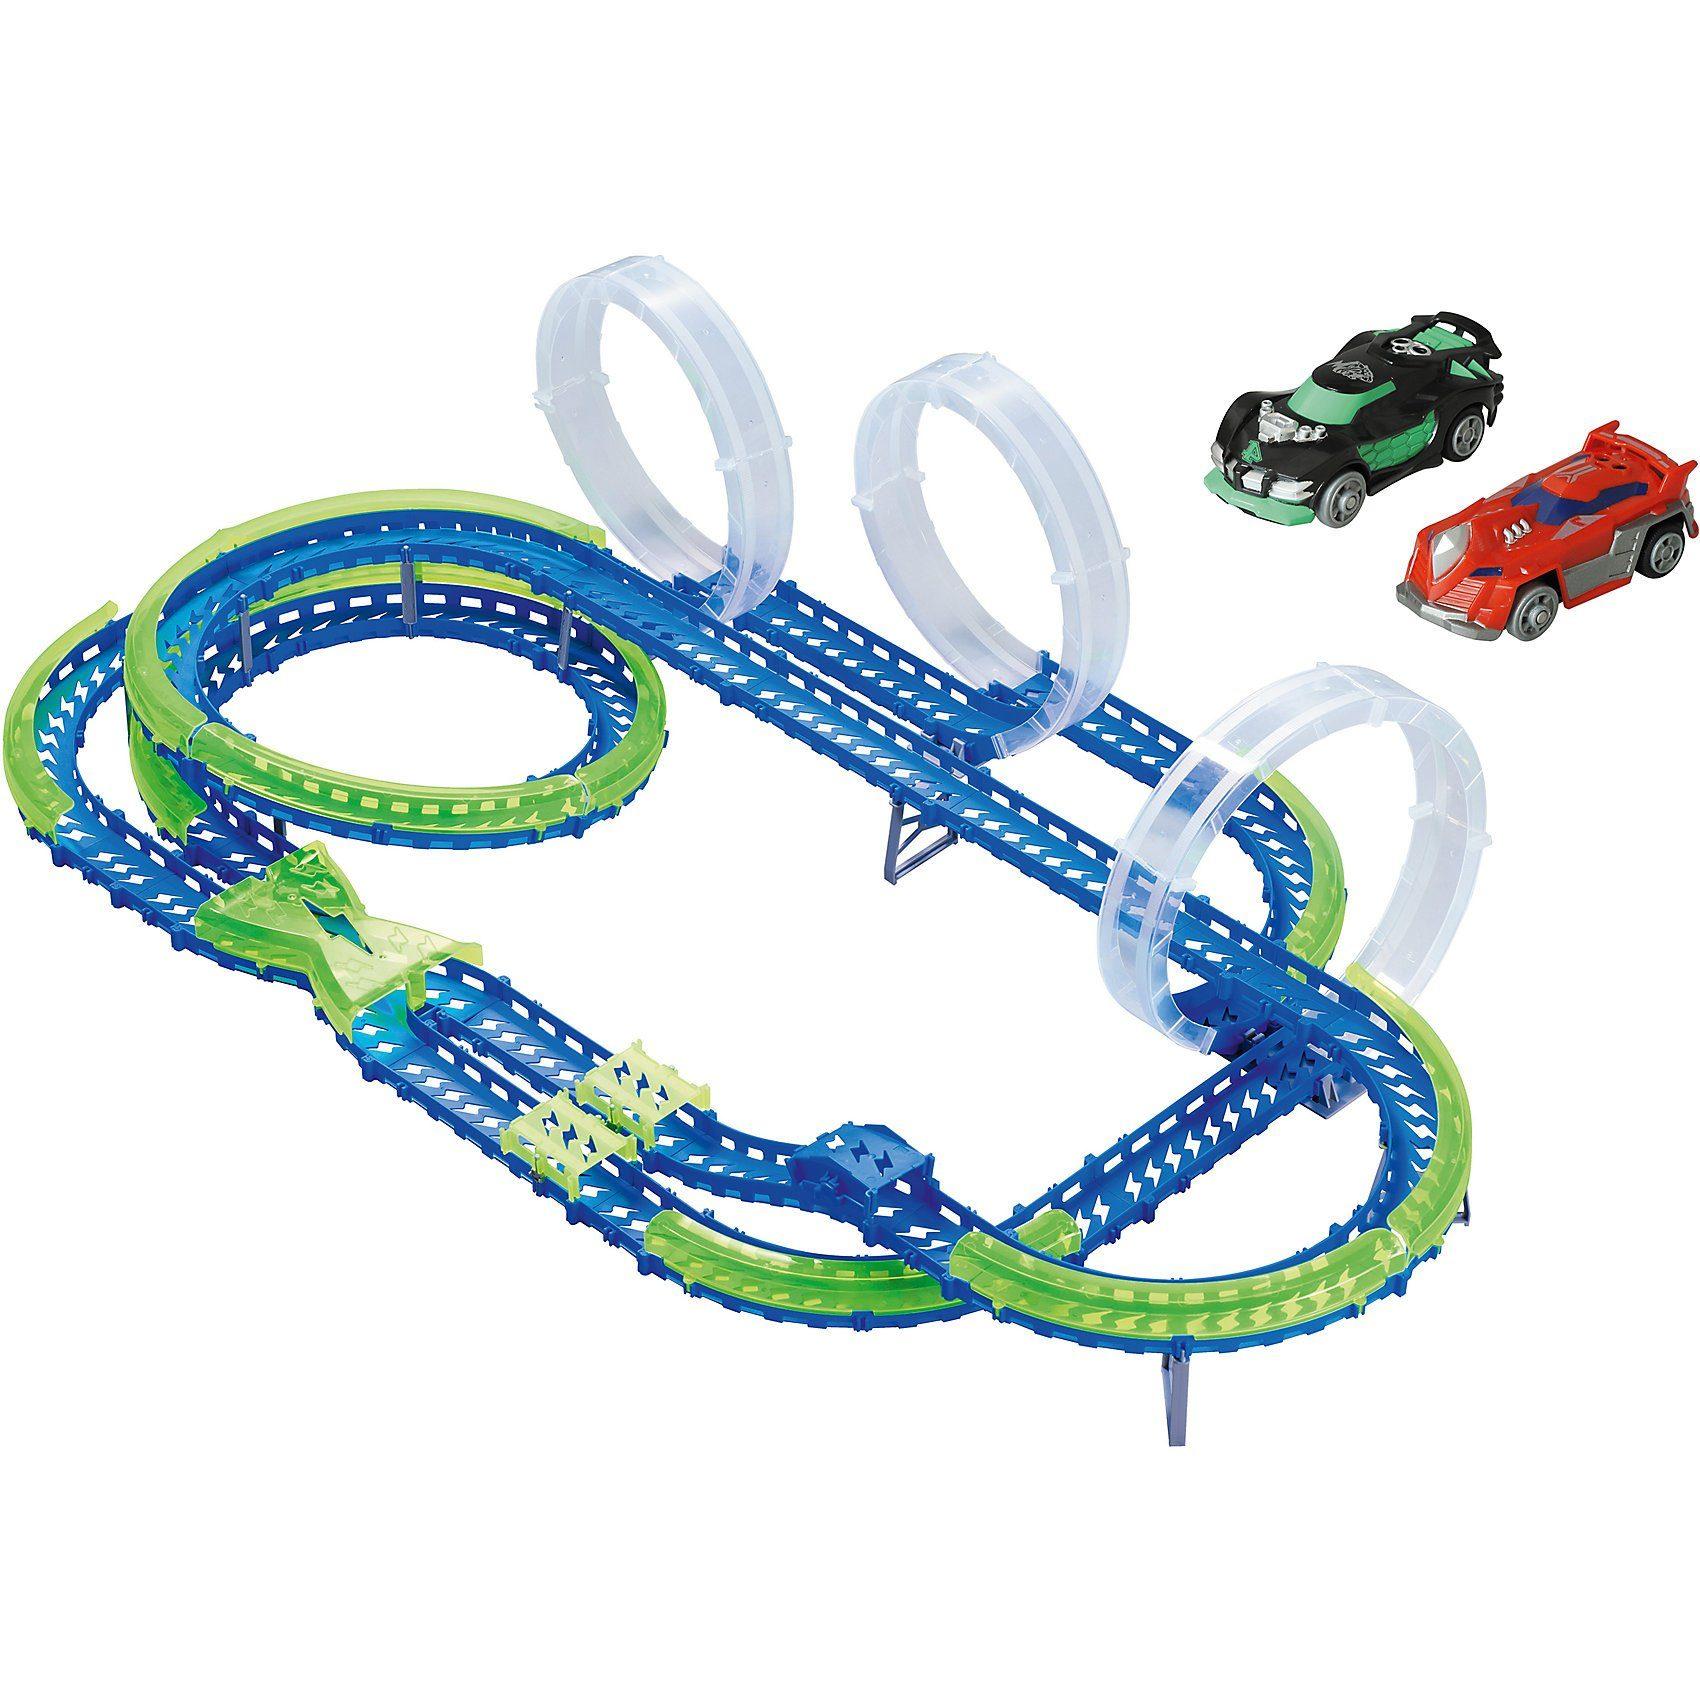 Mega Match Raceway